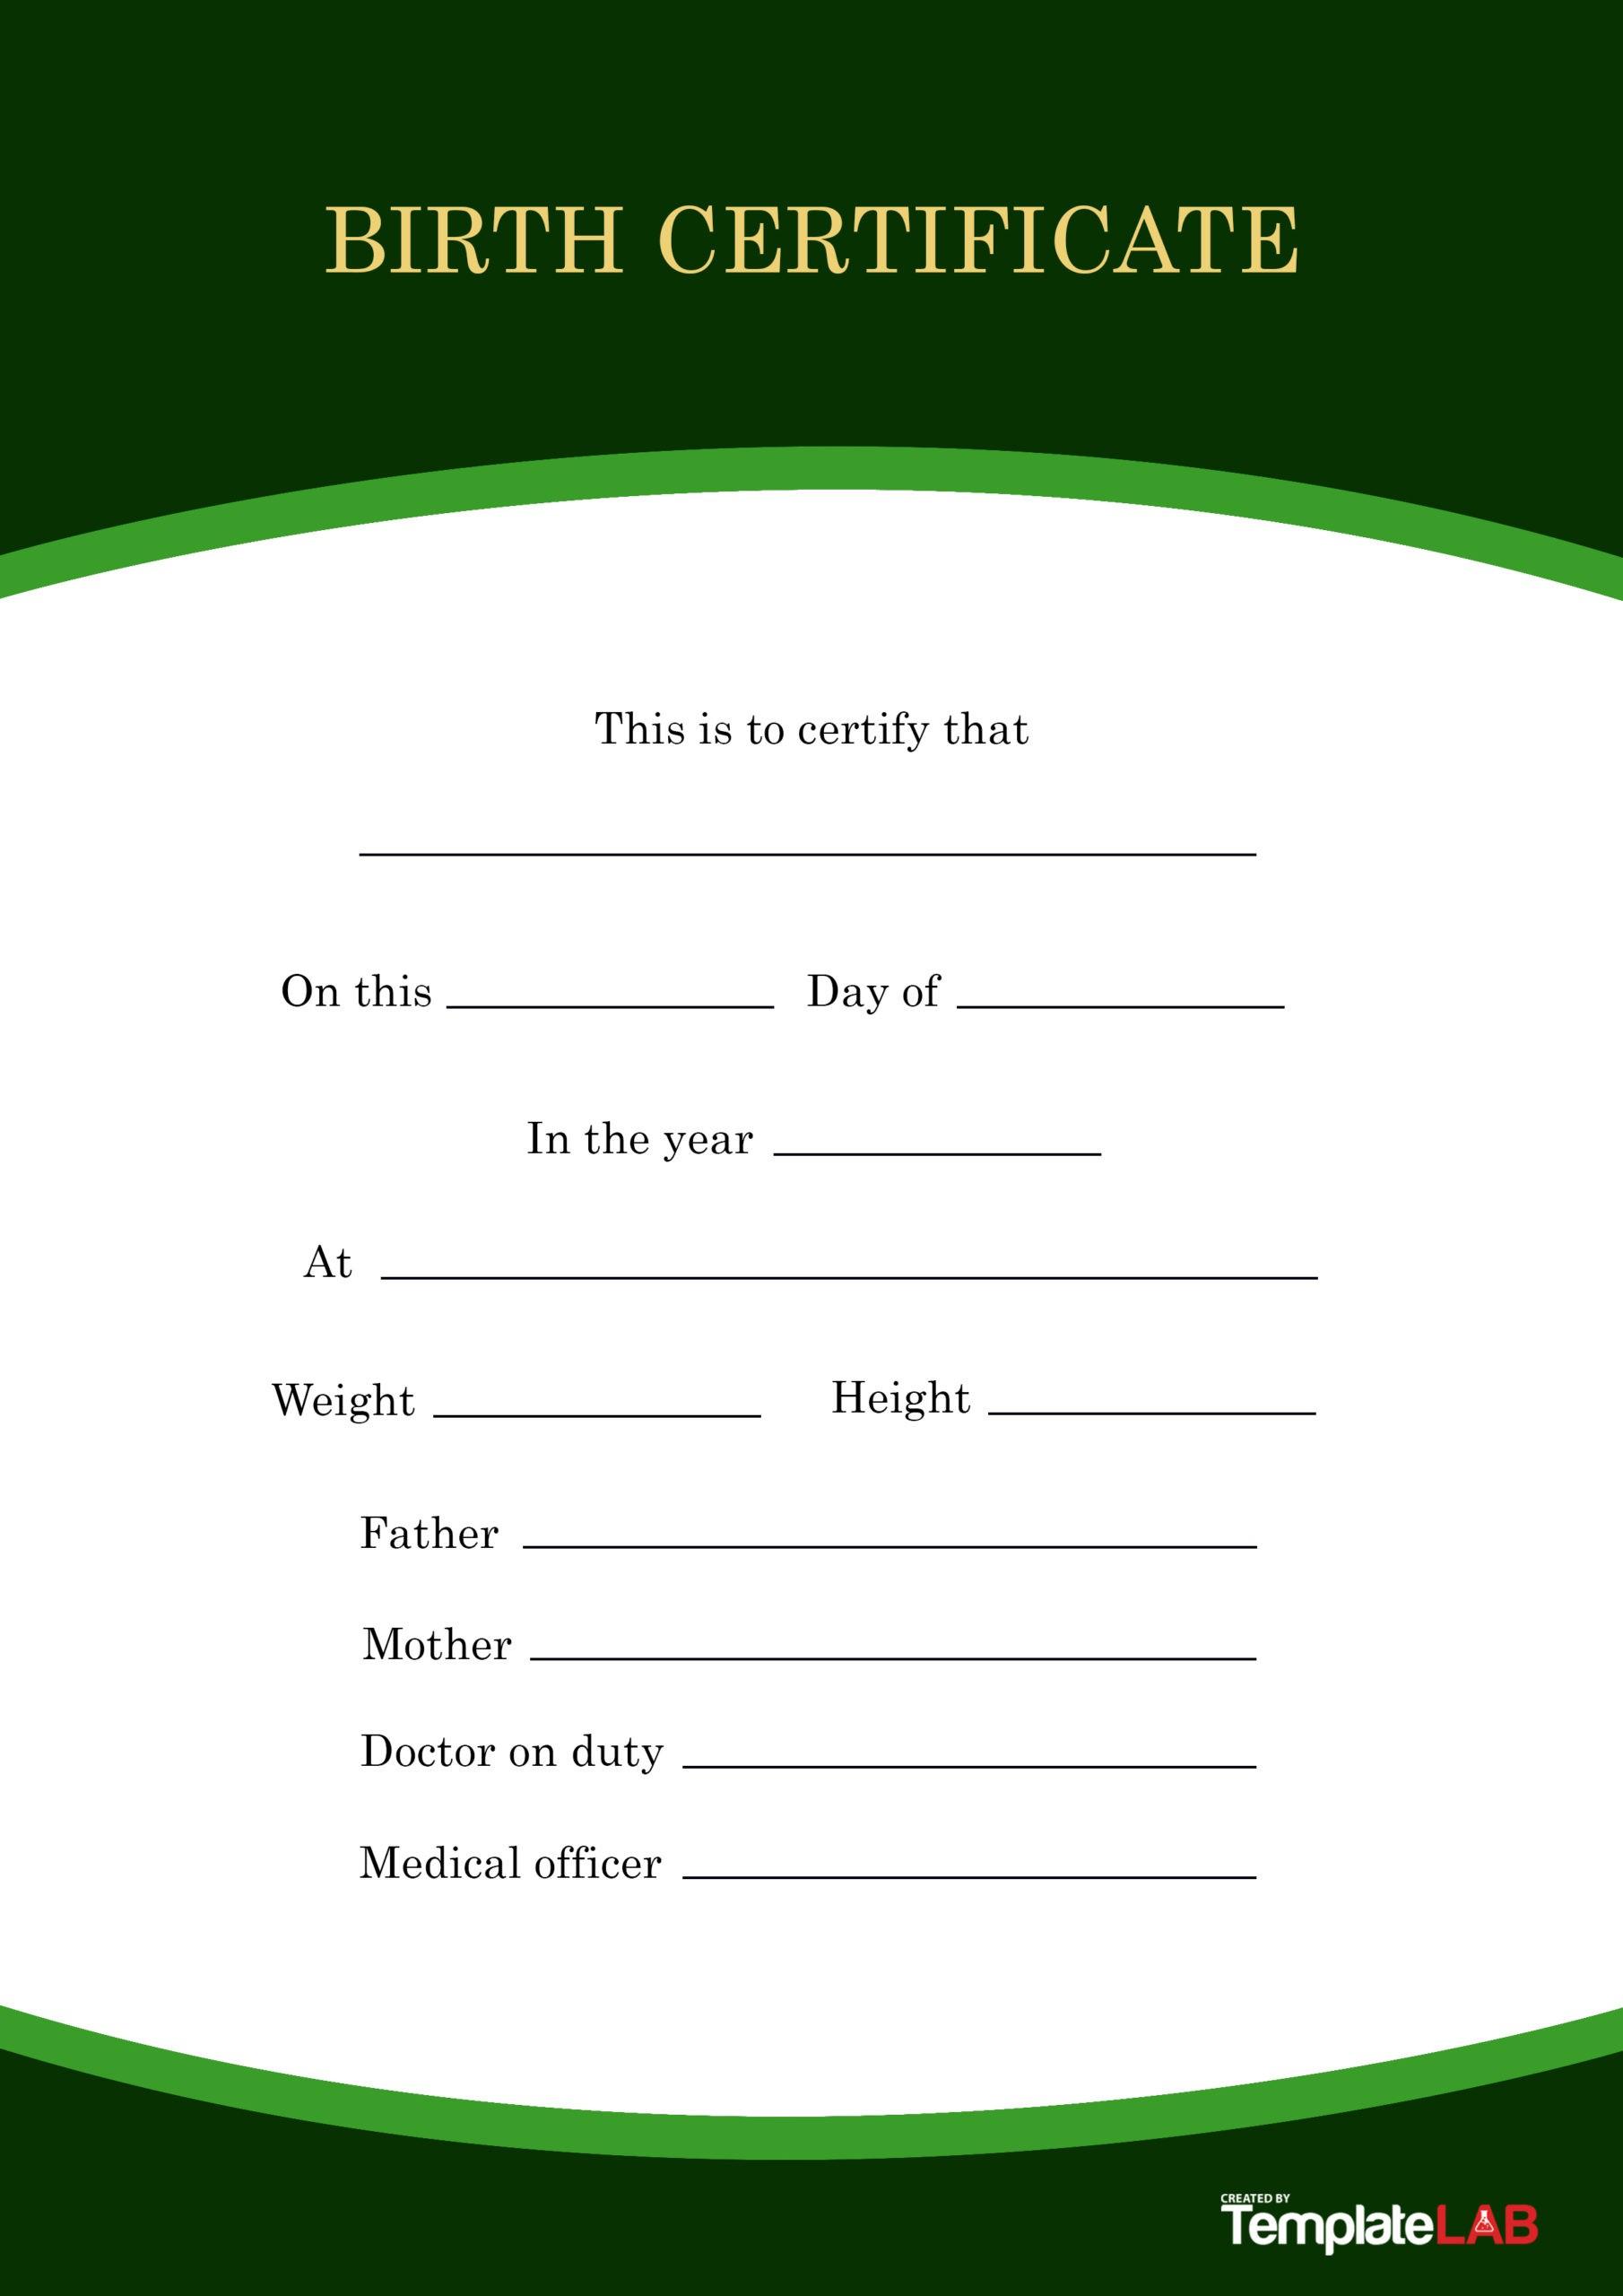 Free Birth Certificate Template 13